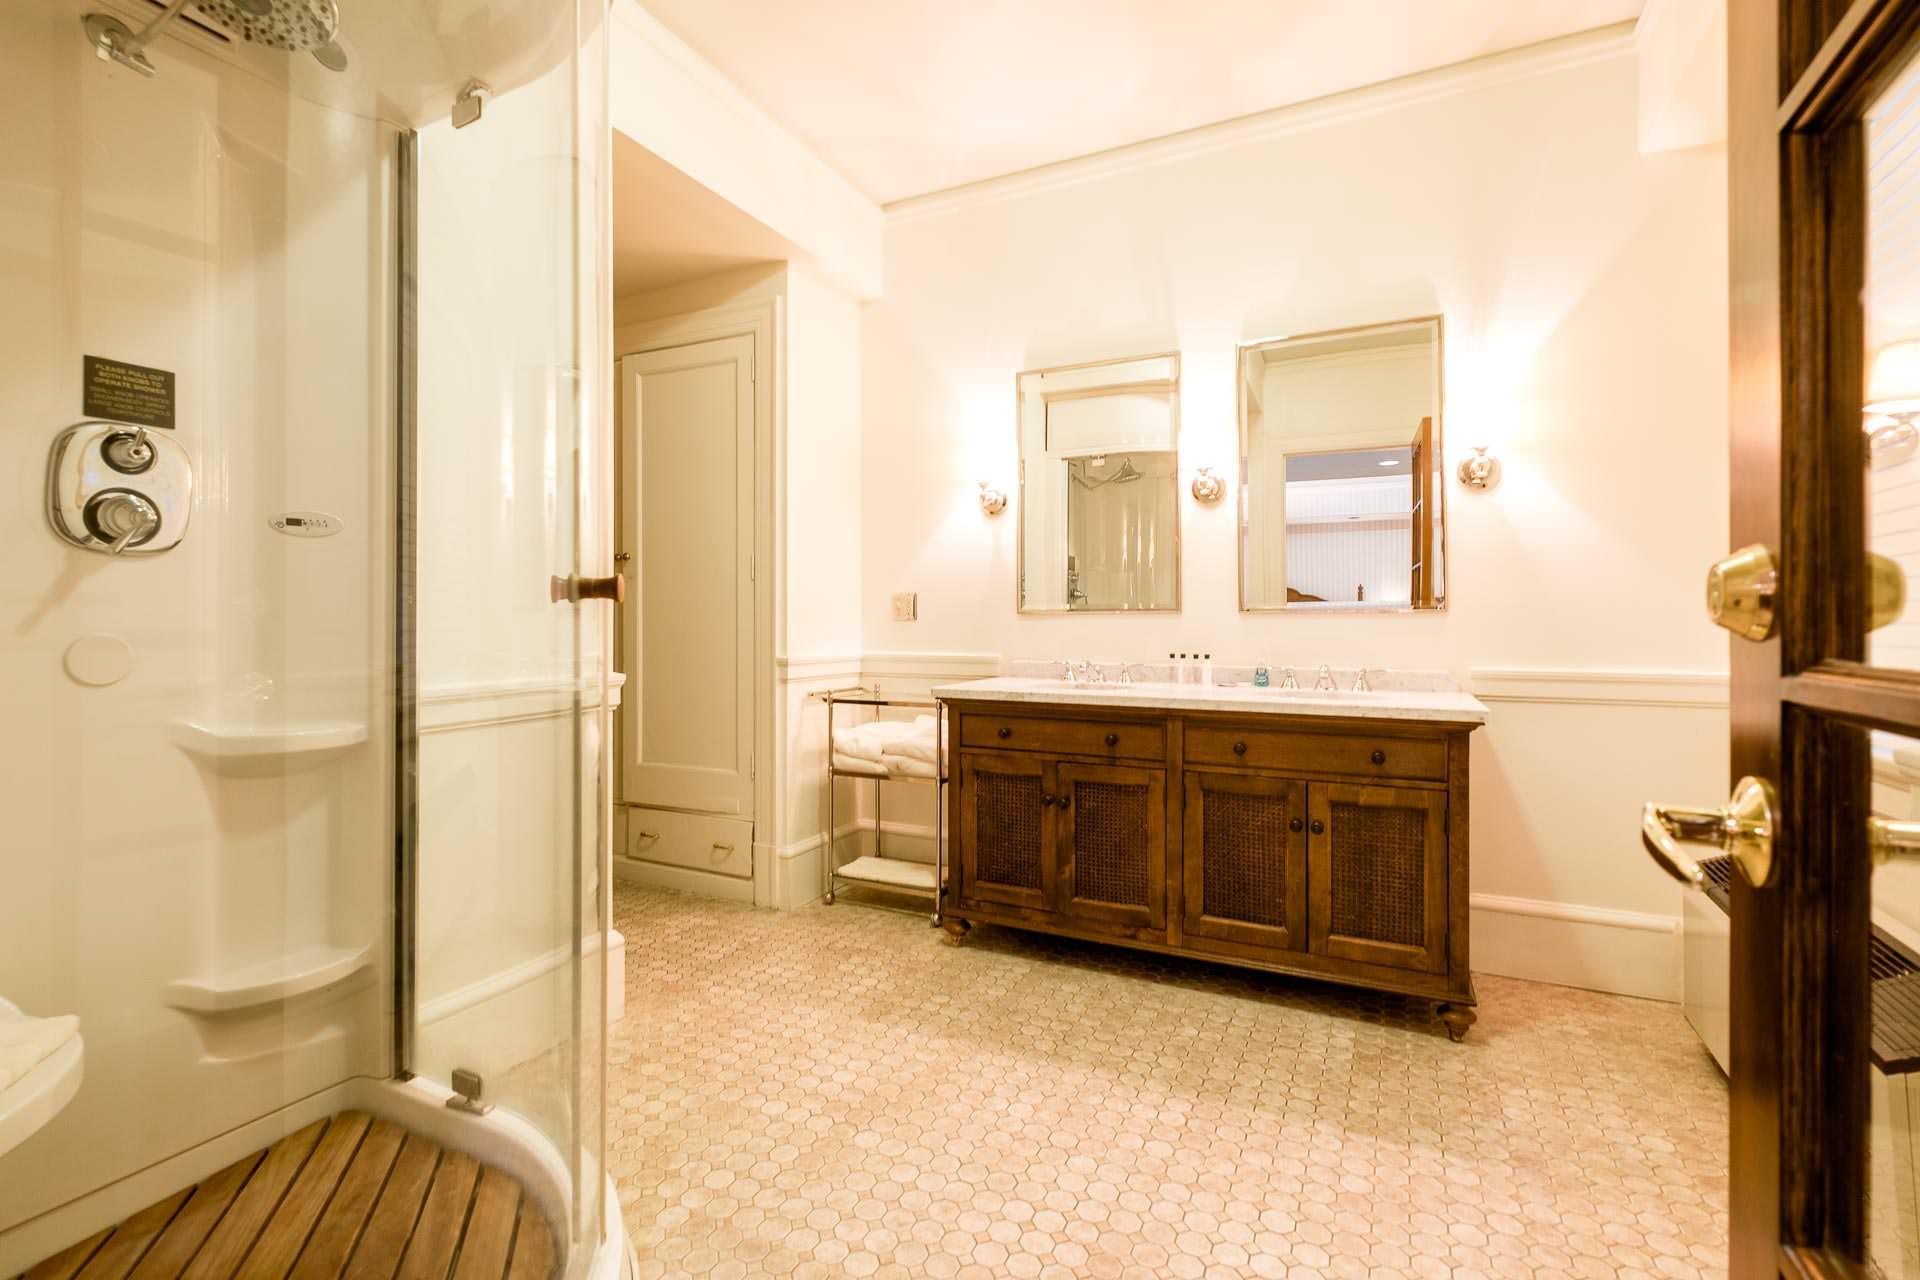 1119 Bathroom HQ.jpg